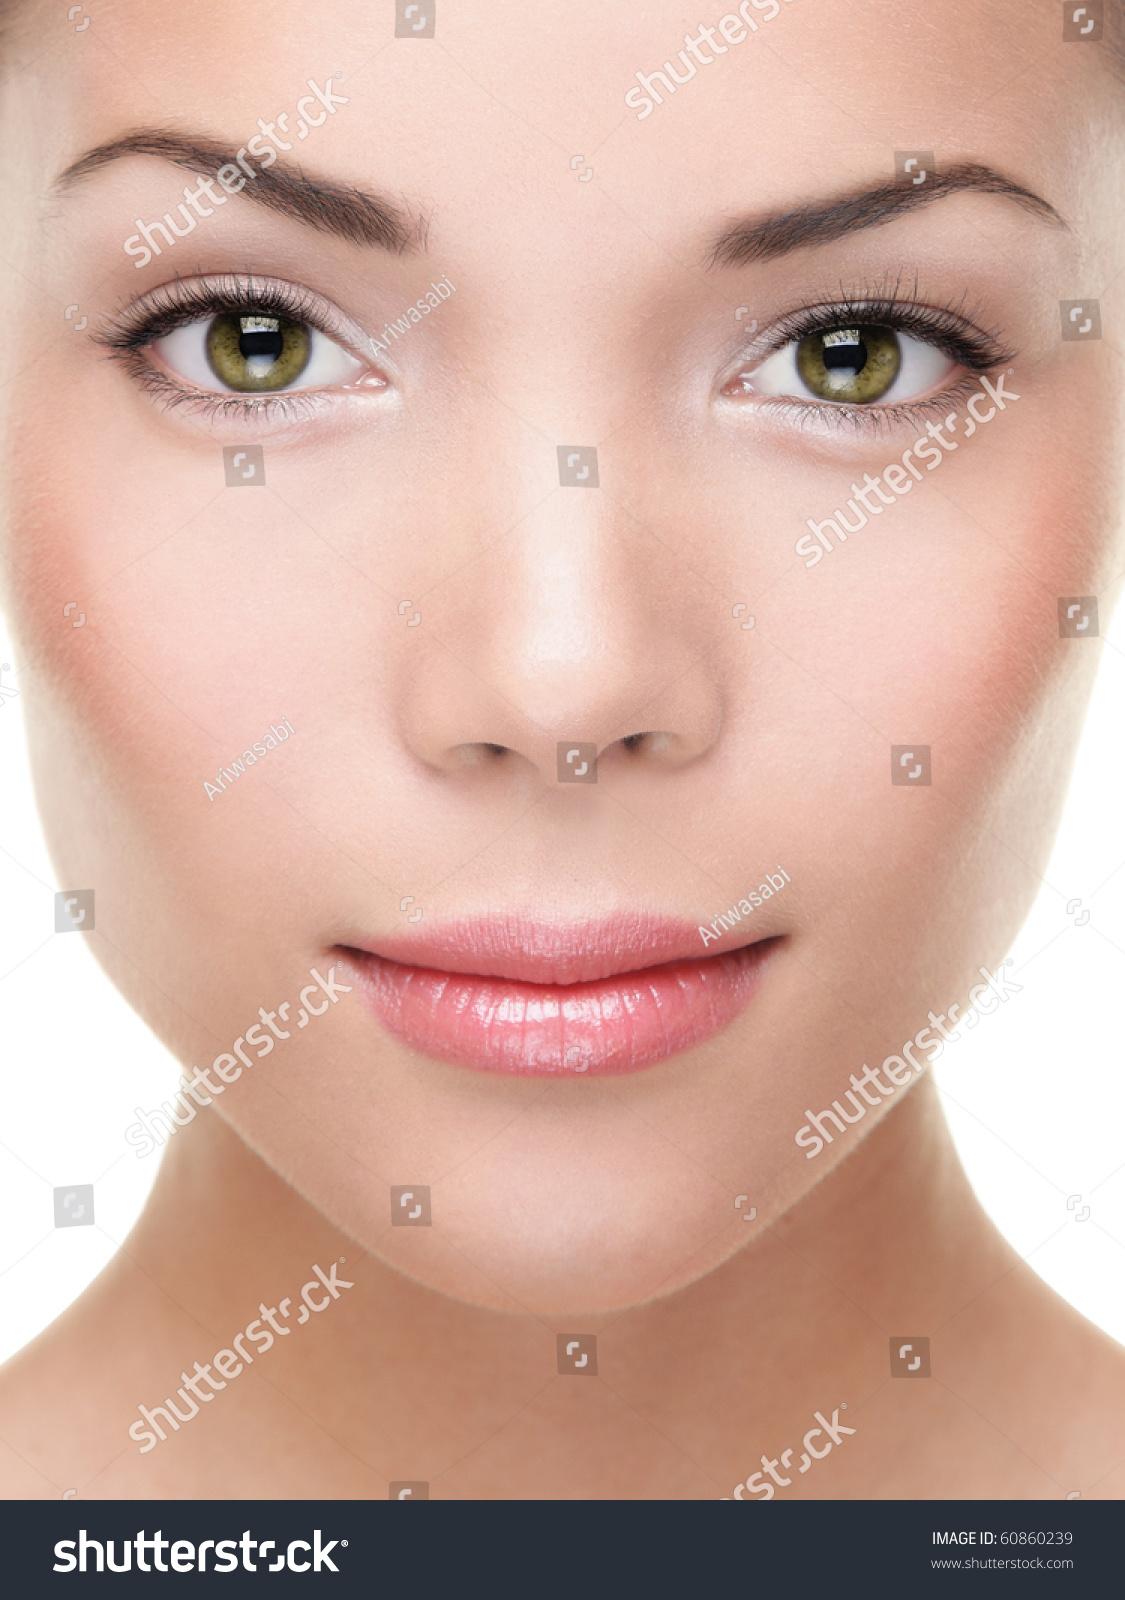 Woman Beauty Portrait Closeup Mixed Race Stock Photo ...